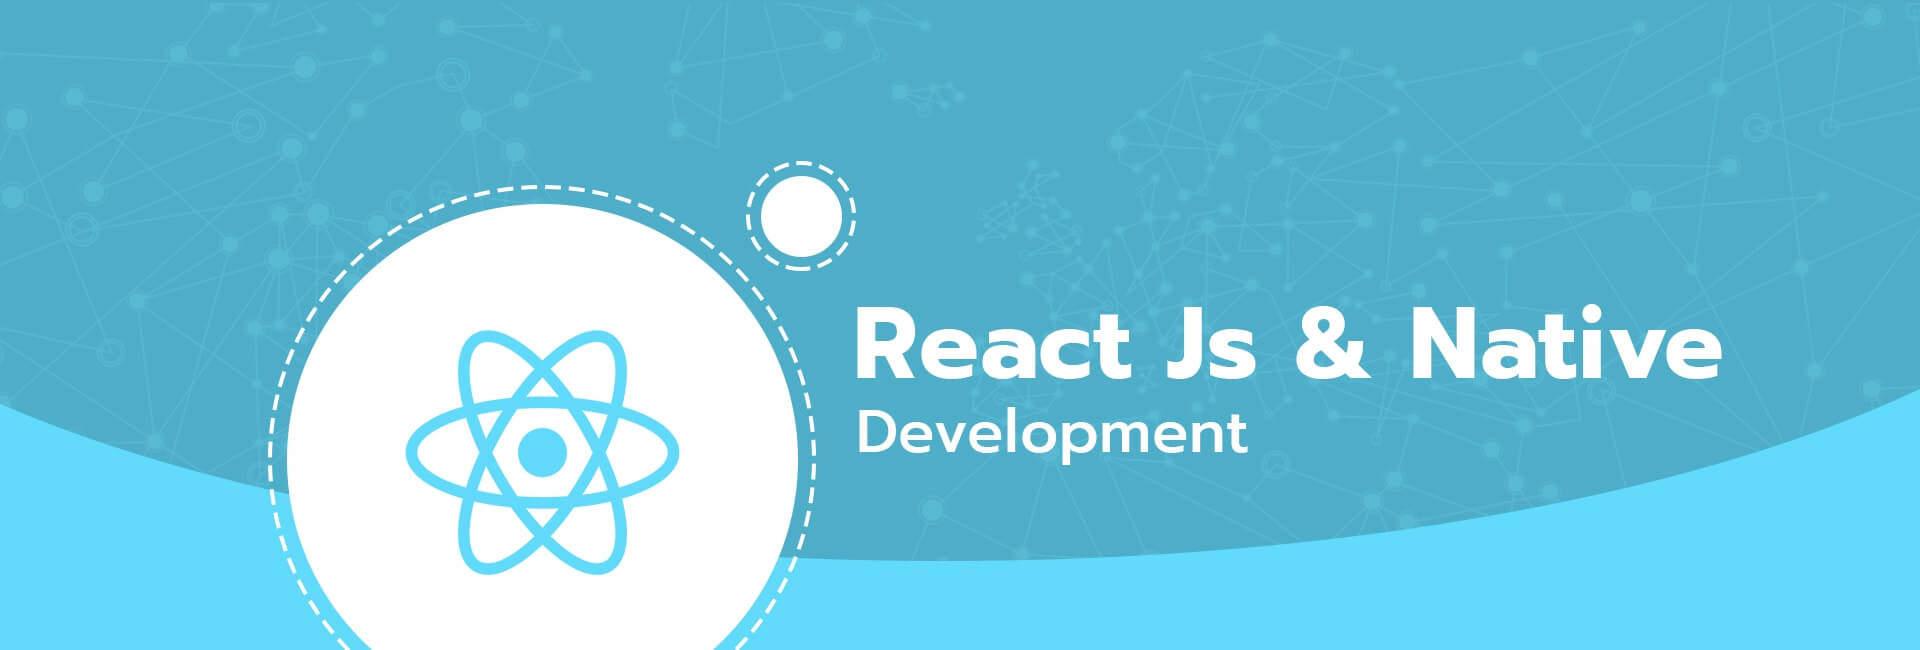 REACT.JS Development India